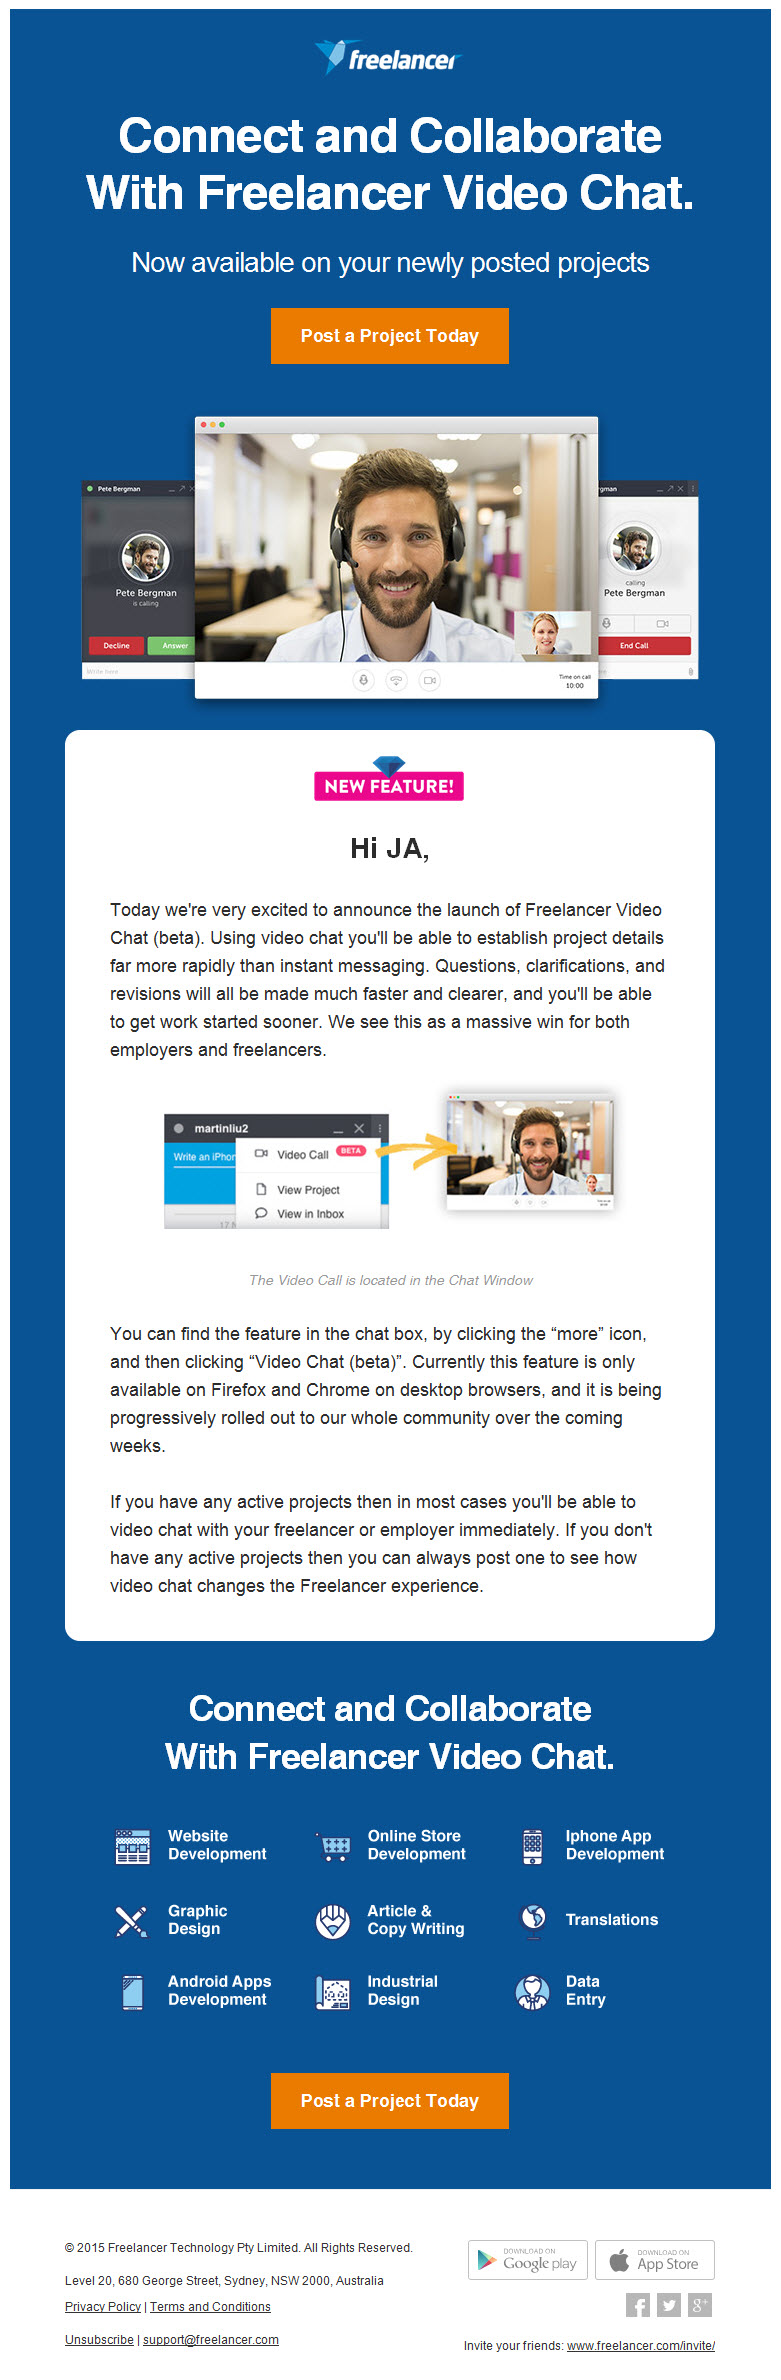 Freelancer.com new feature email